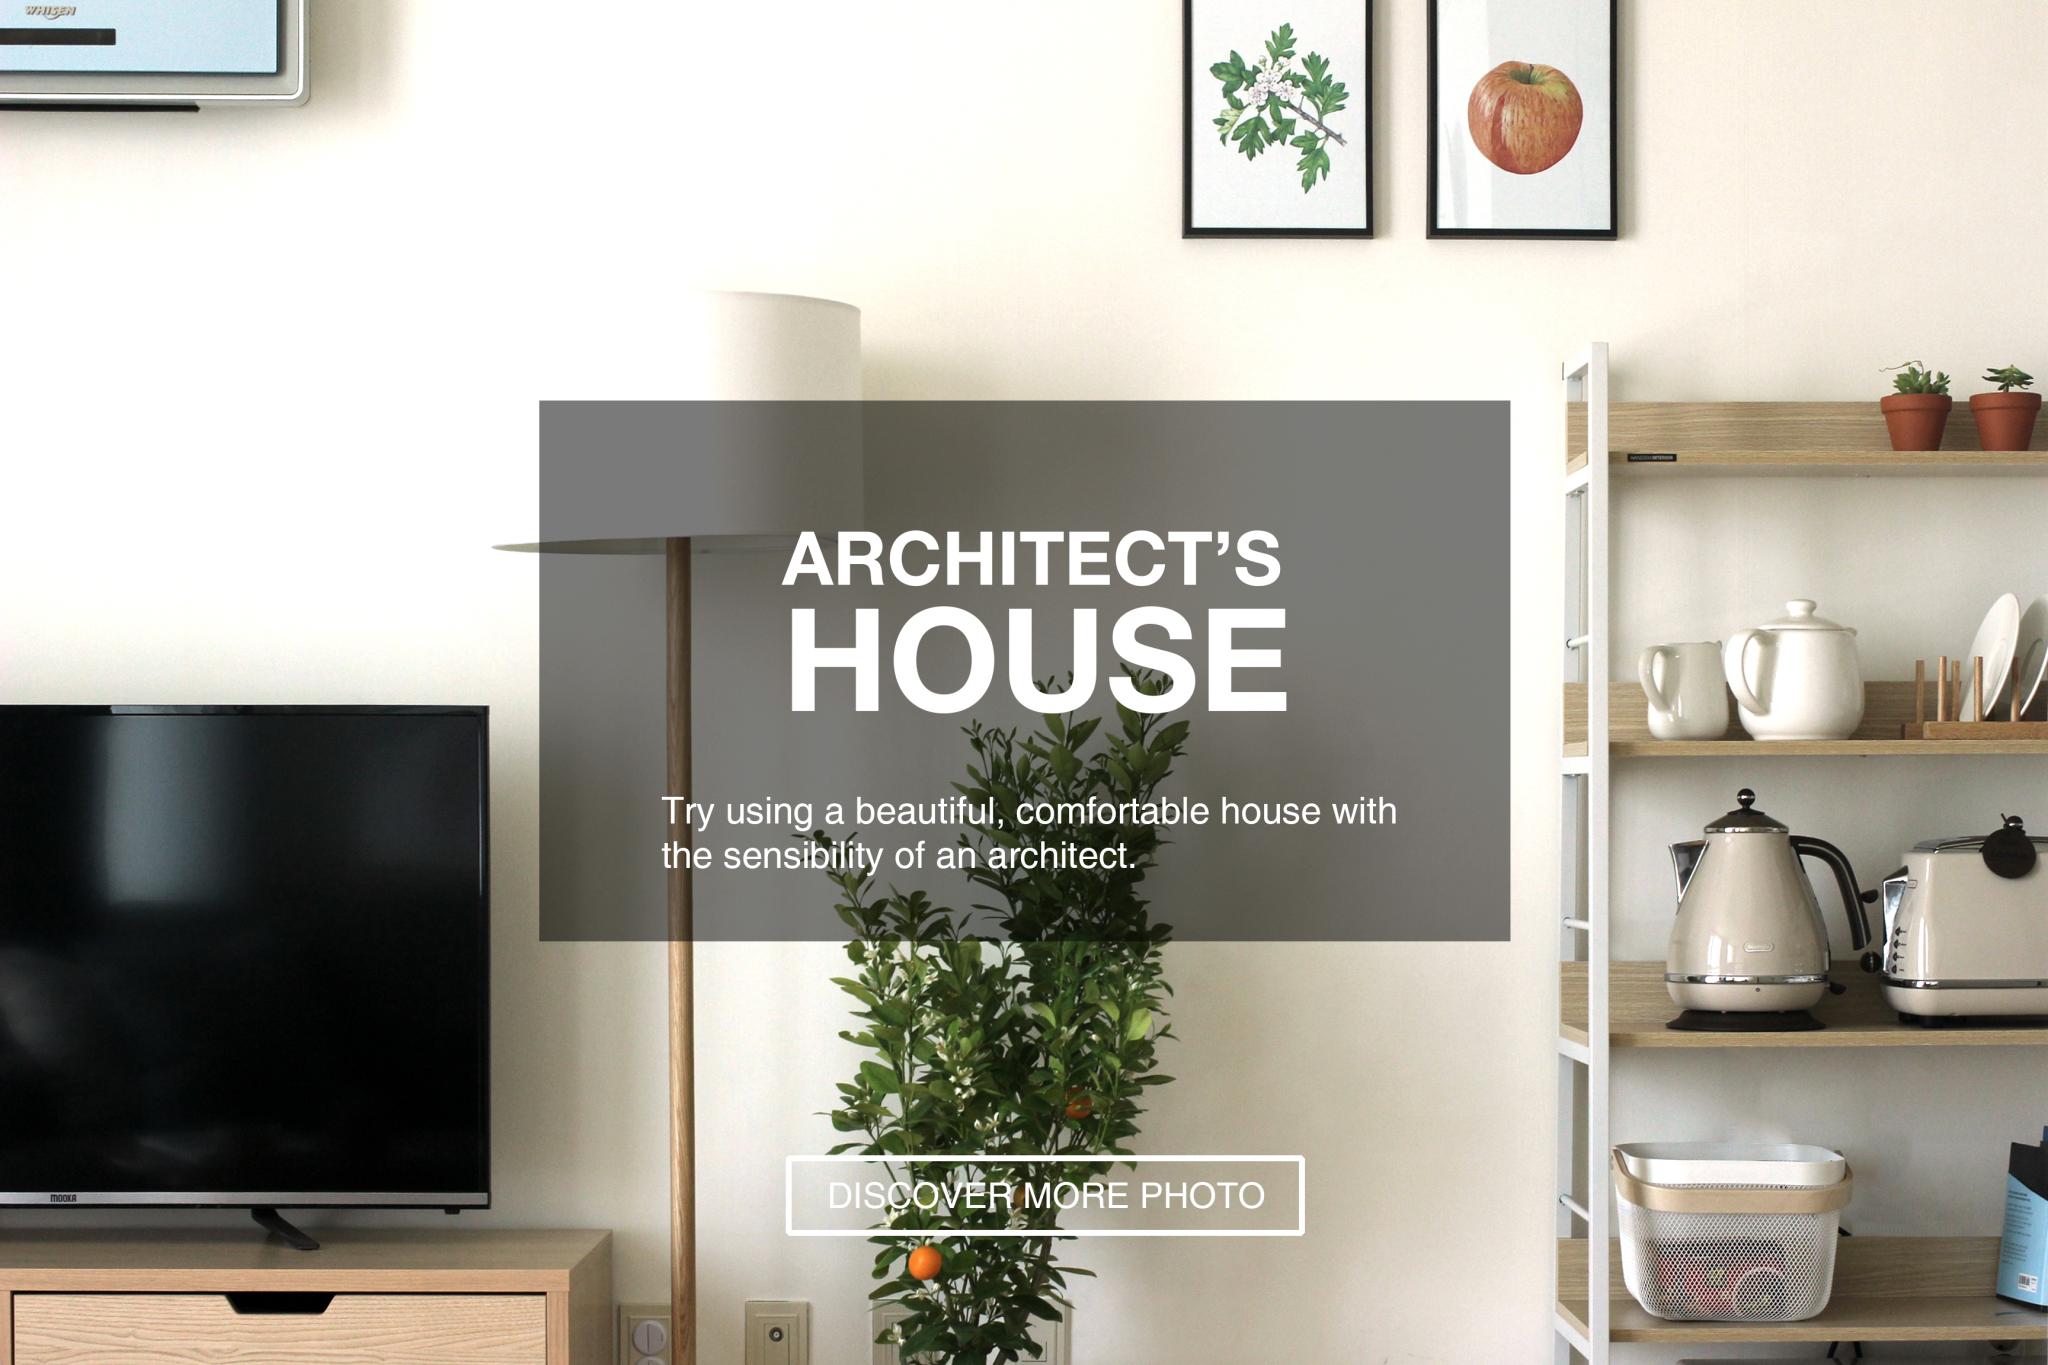 Architect's House